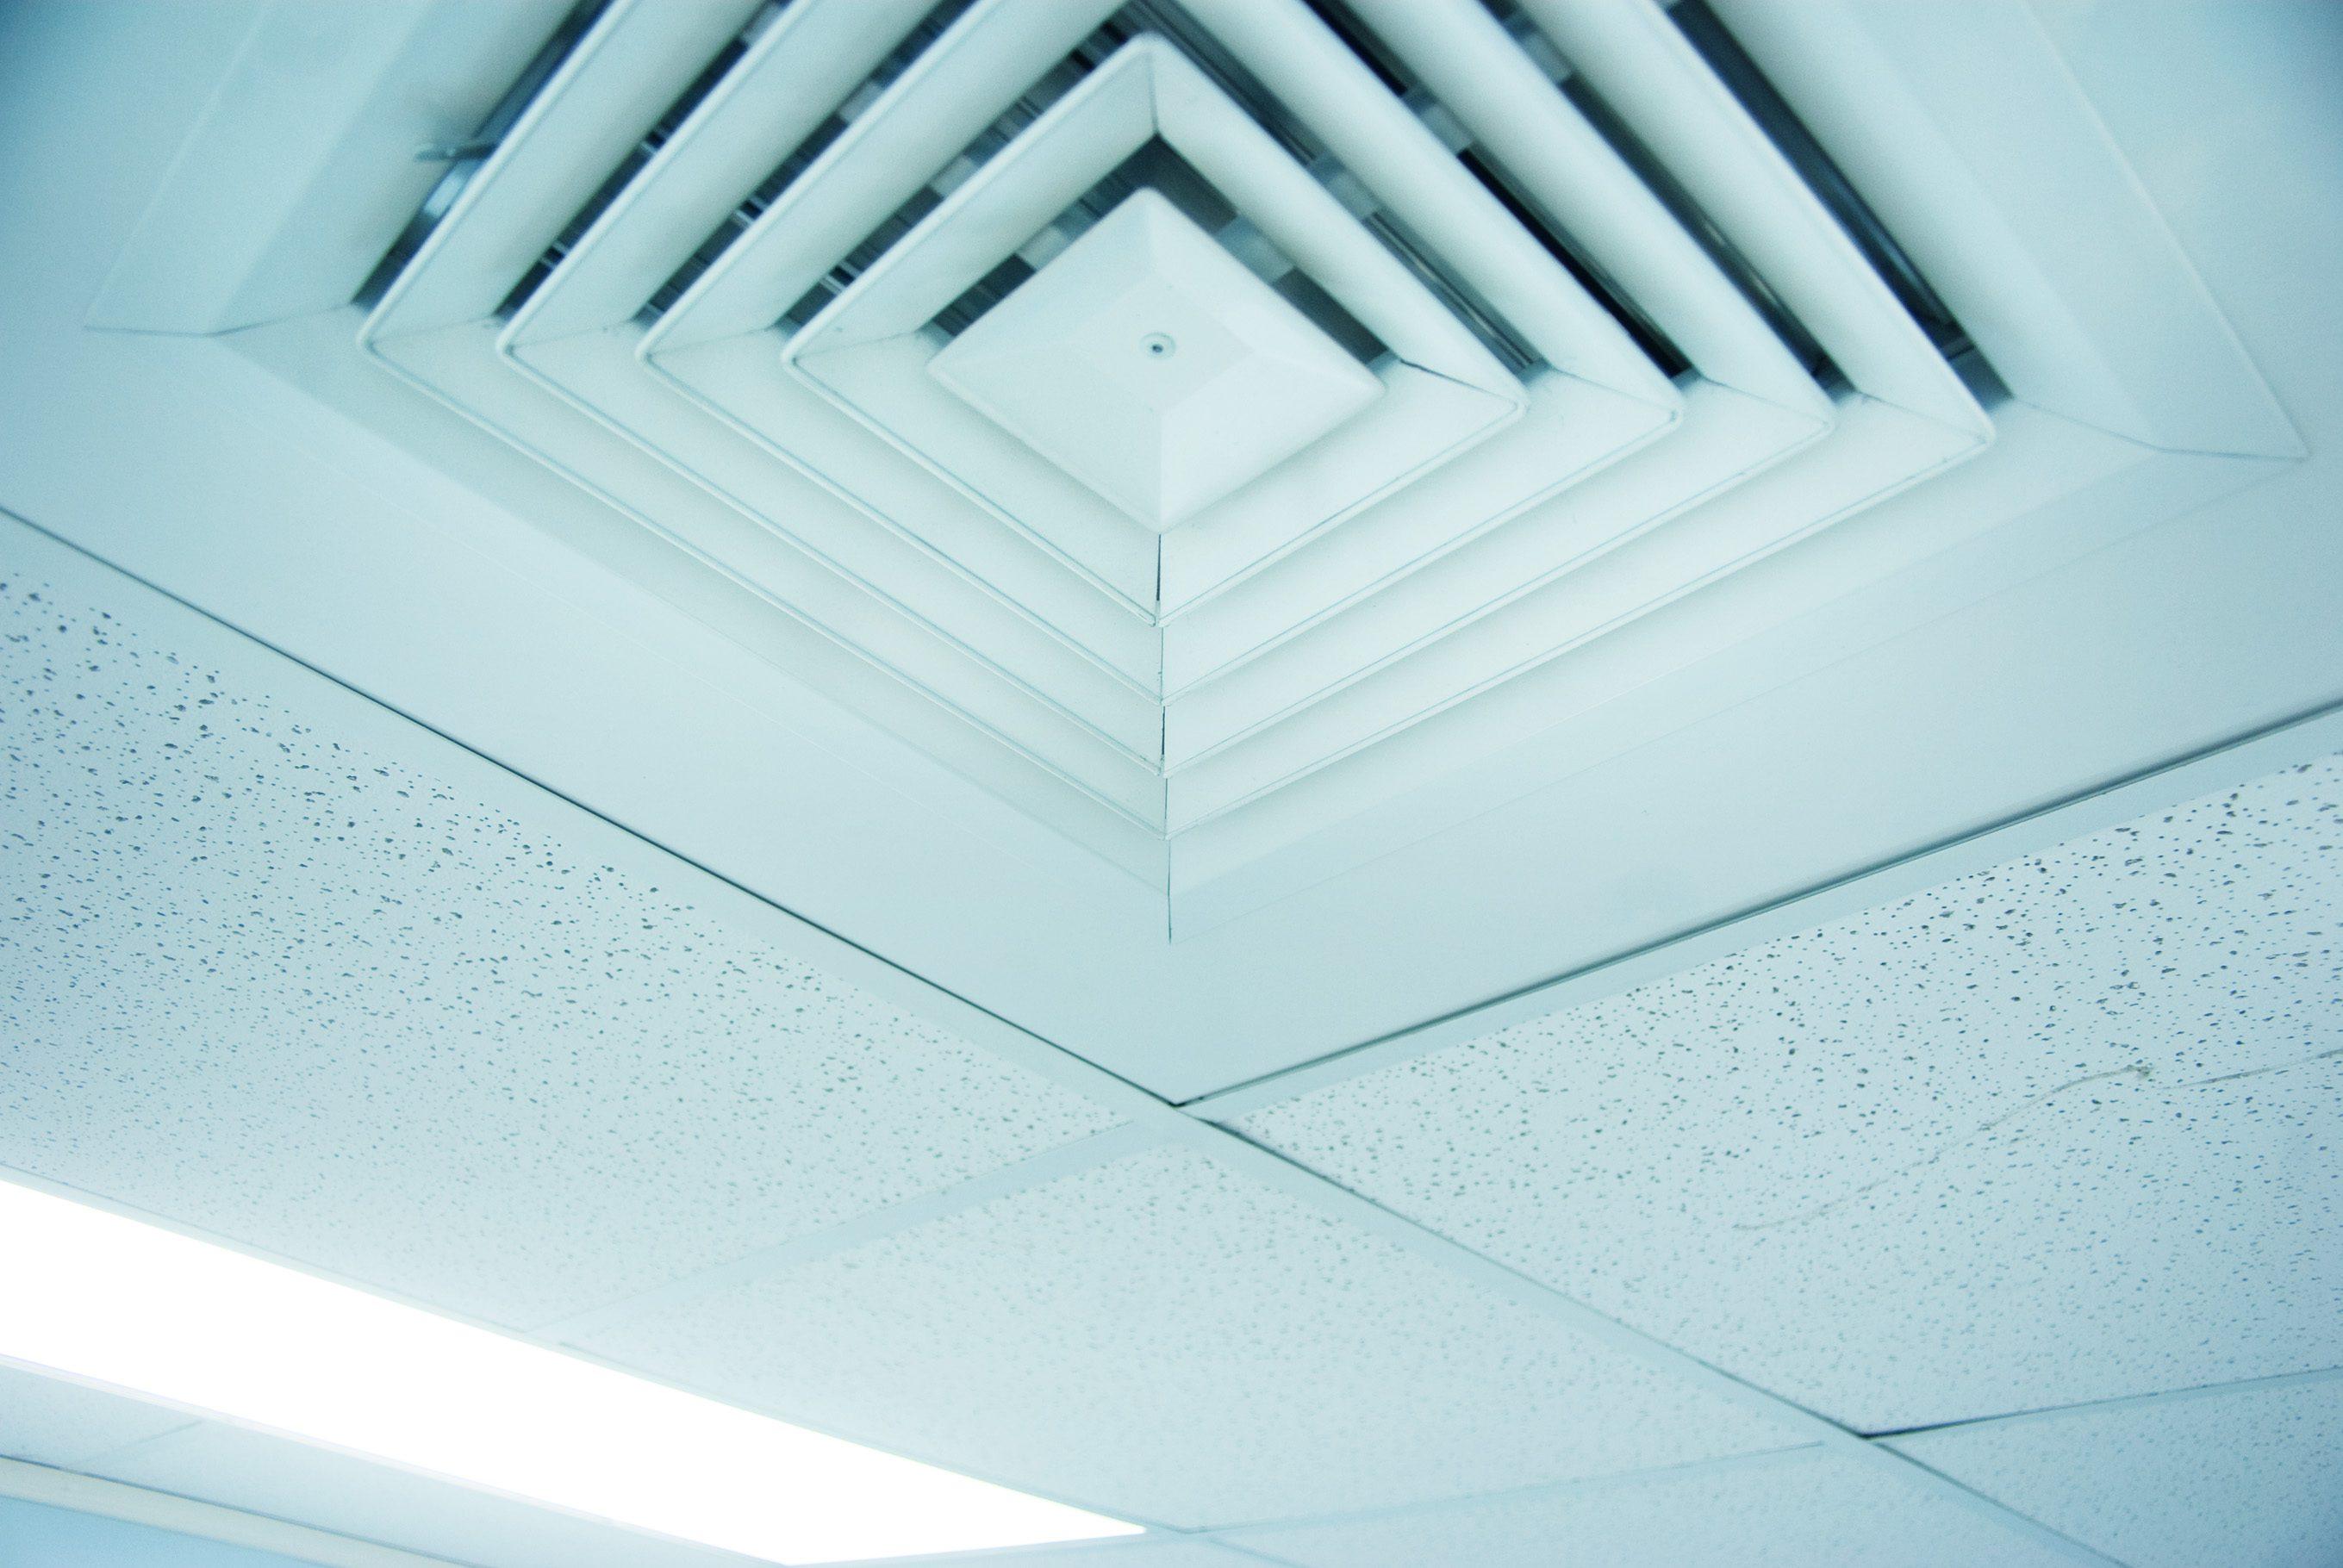 air conditioner vent close up in ceiling